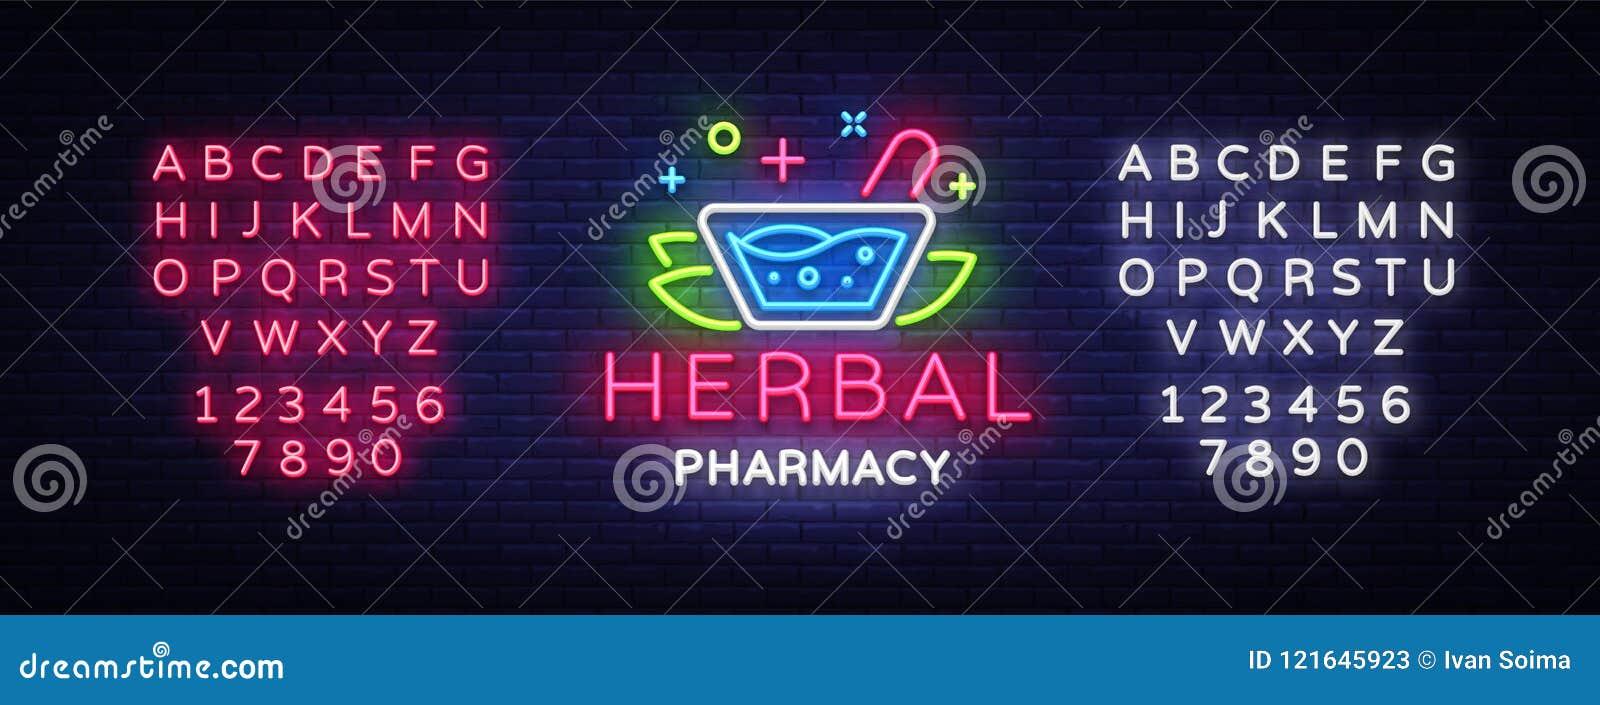 herbal pharmacy neon sign vector pharmacy design template neon sign